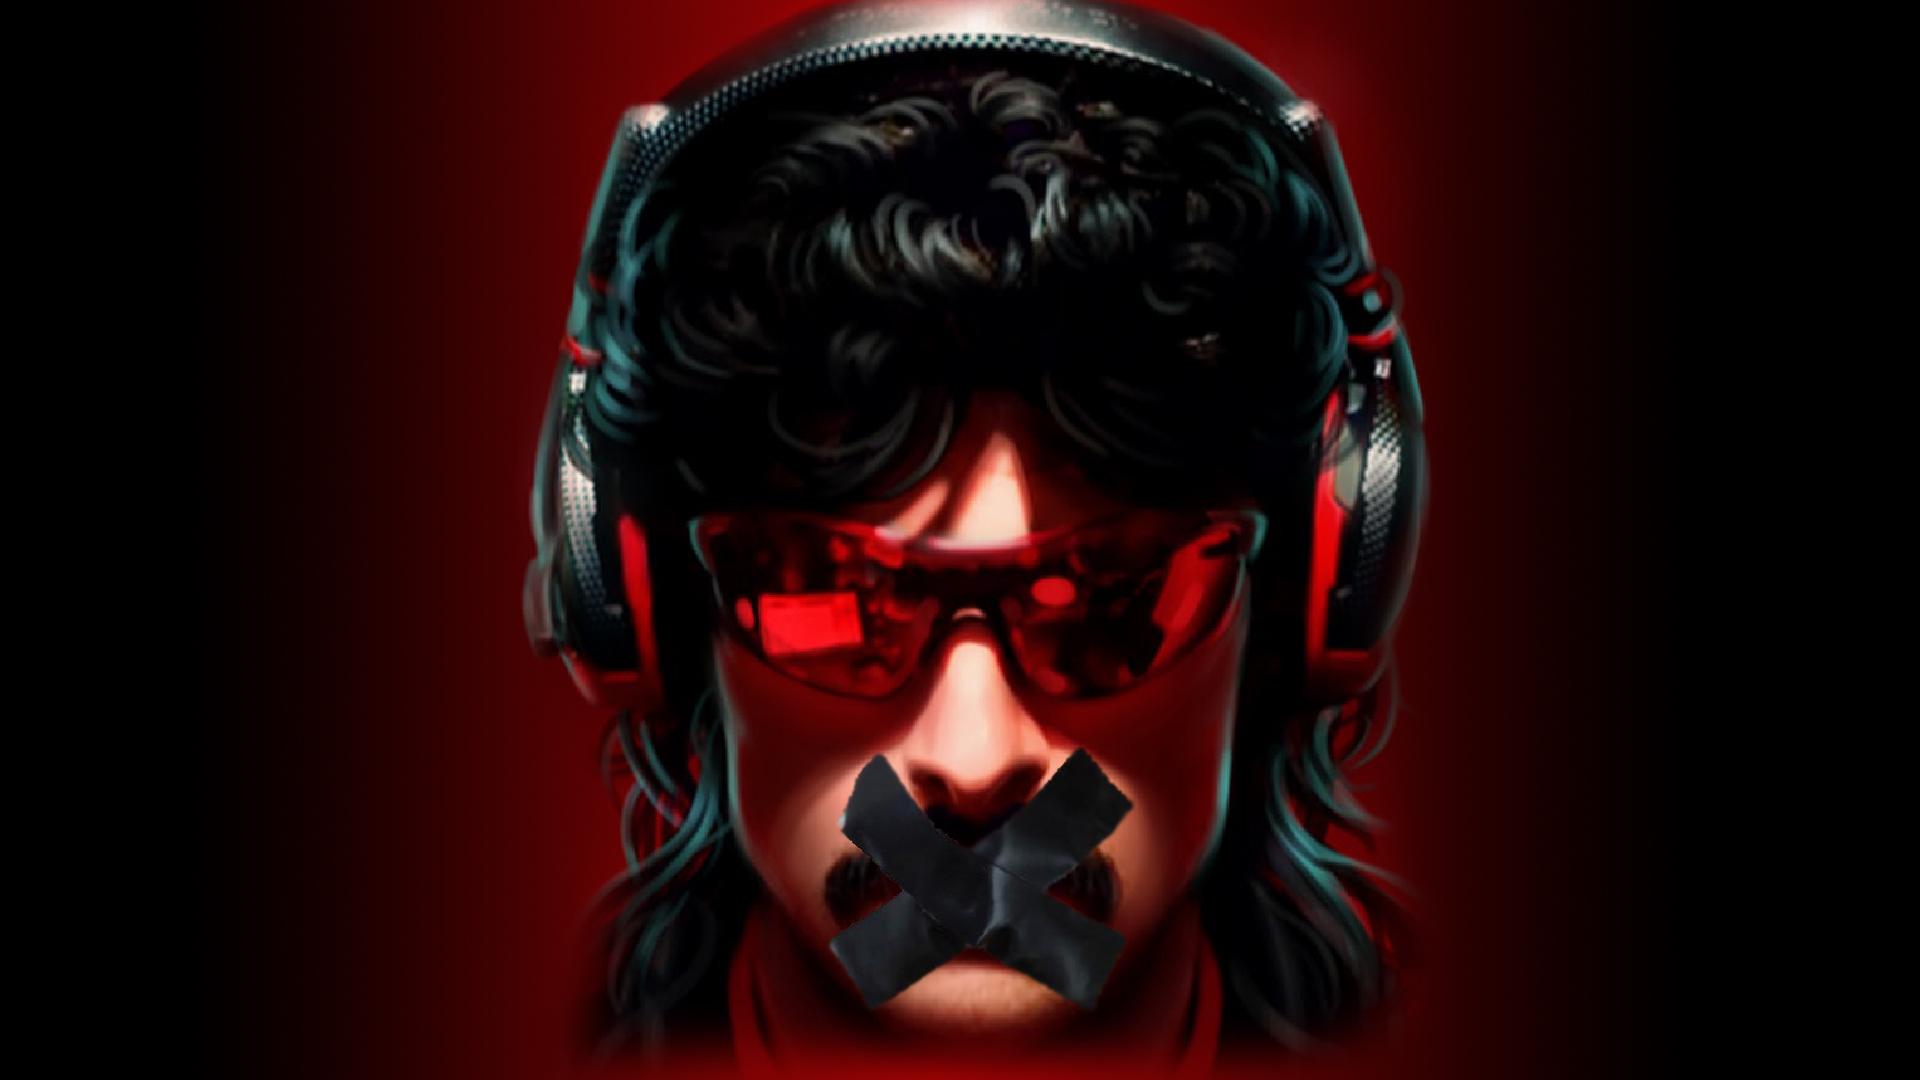 Dr Disrespect : Η σιωπή γύρω από το ban του sto Twitch